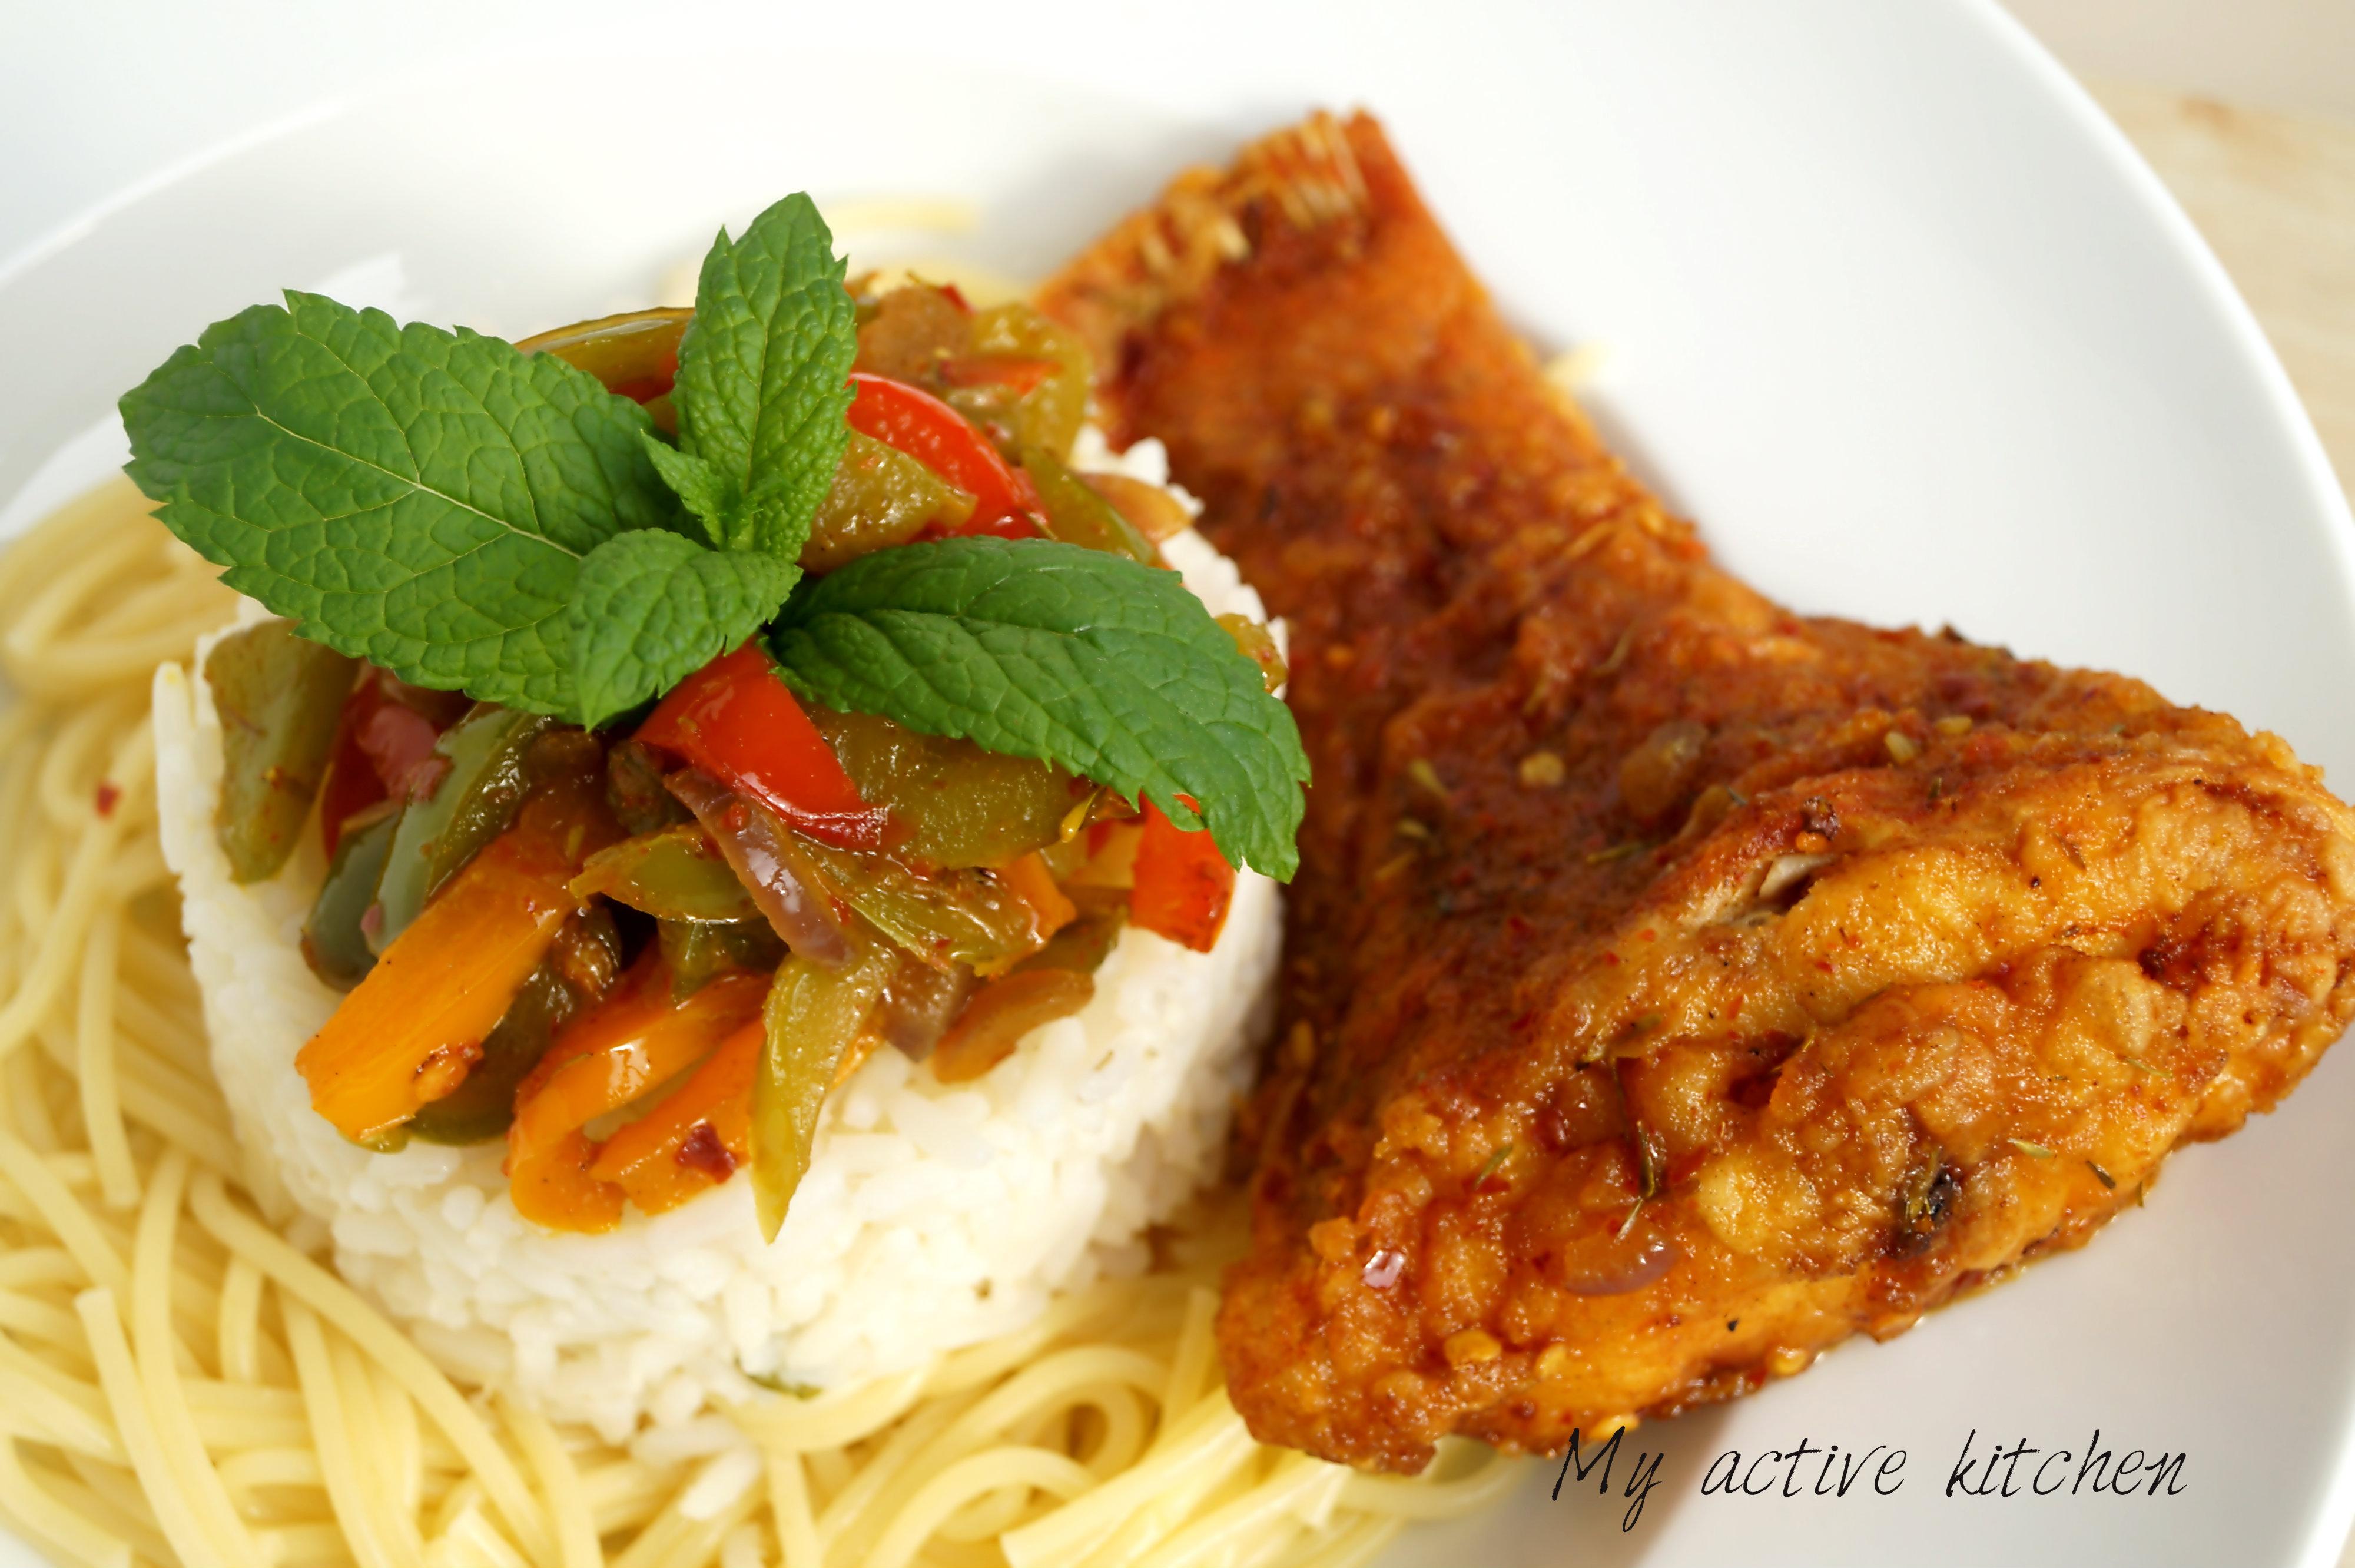 nigerian stir fry recipe